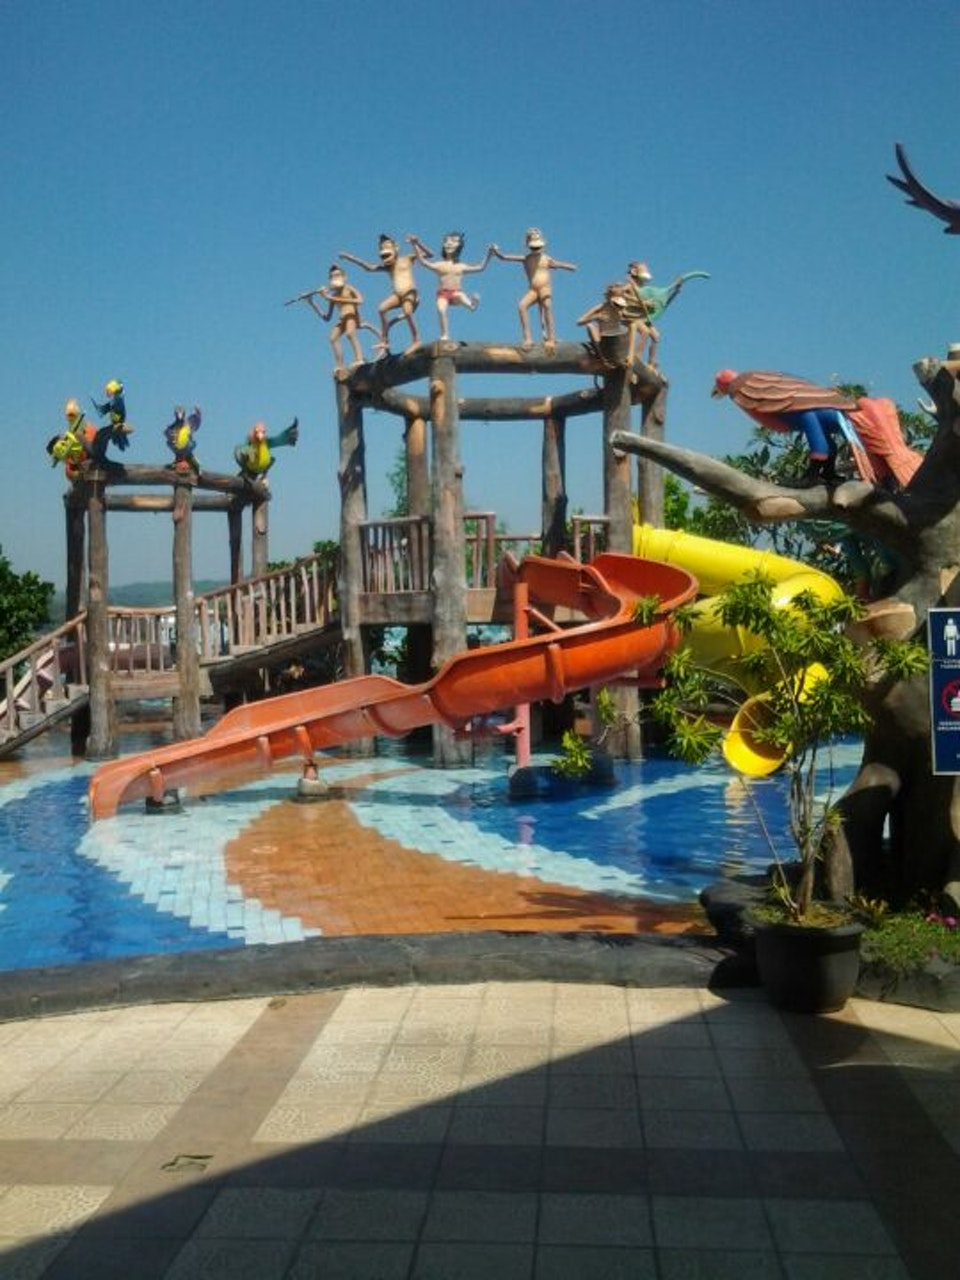 Dream Wisata Air Kota Semarang Jungle Toon Water Park Waterpark